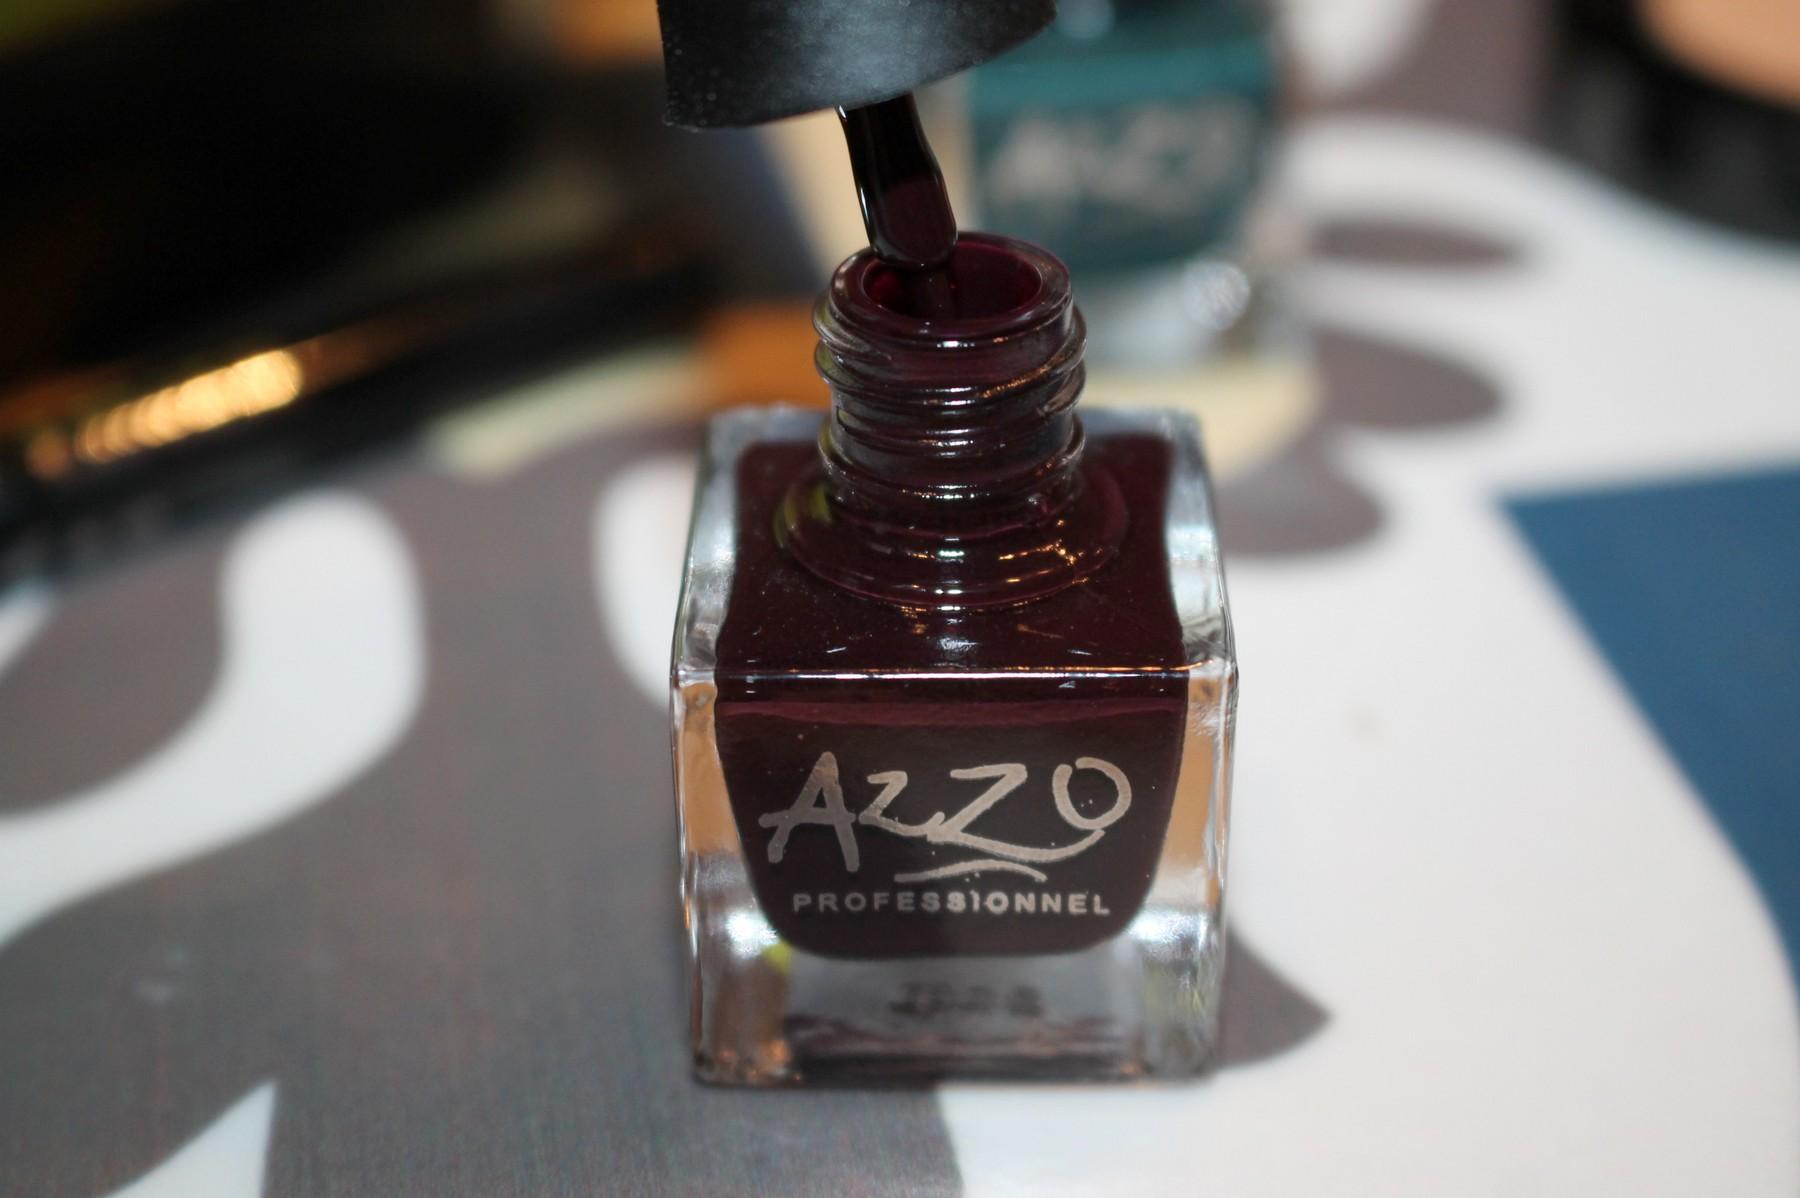 AZZO3